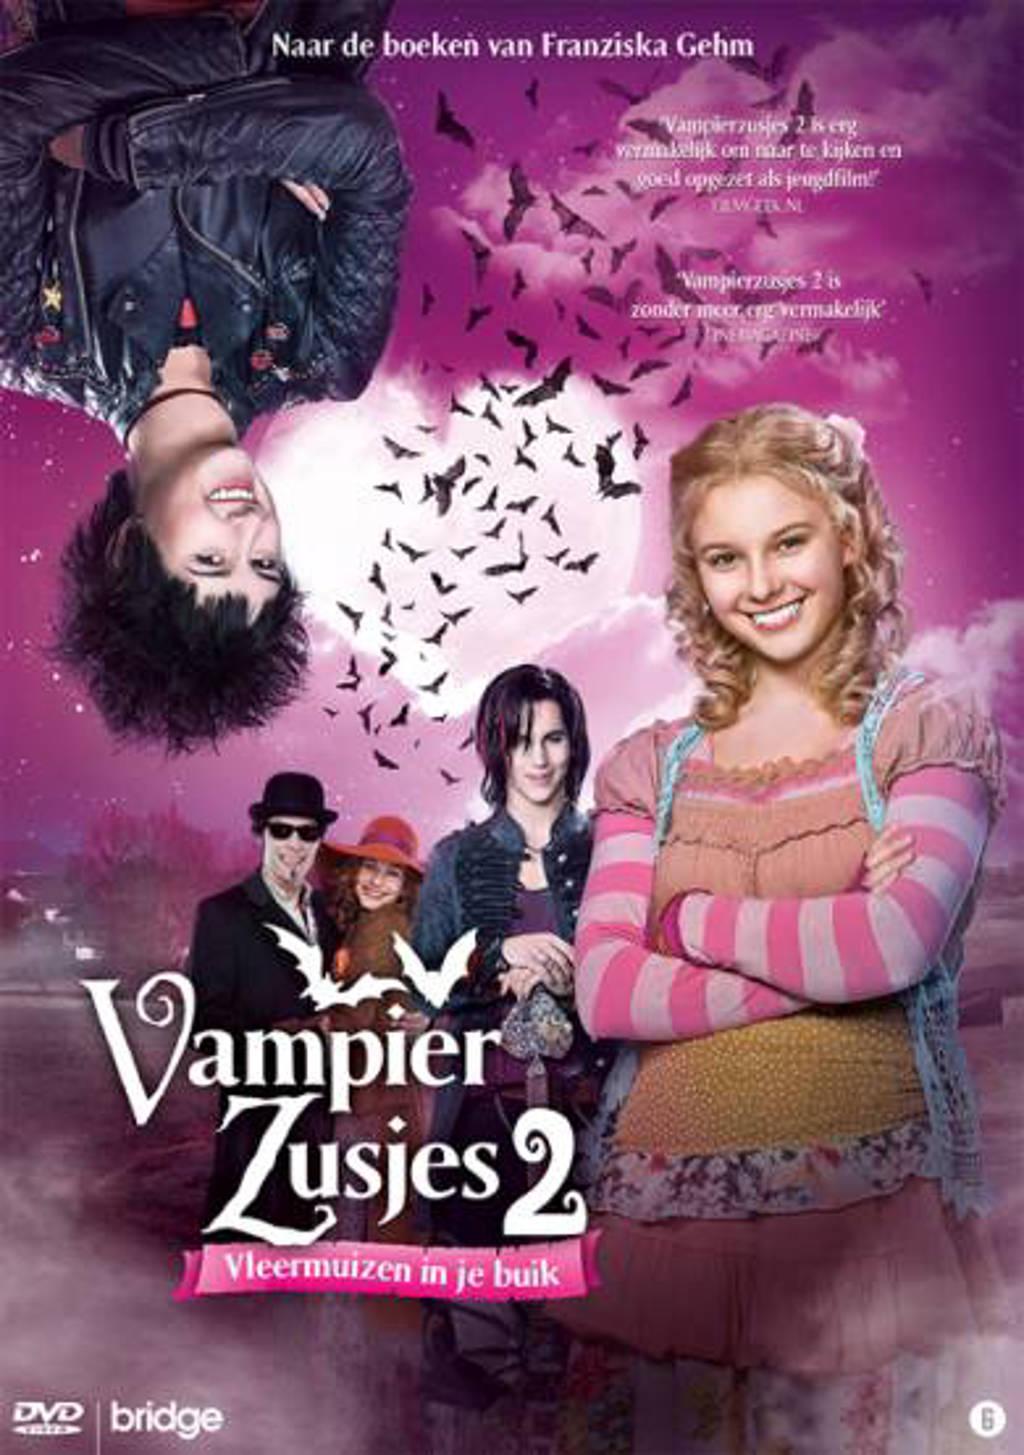 Vampier zusjes 2 (DVD)